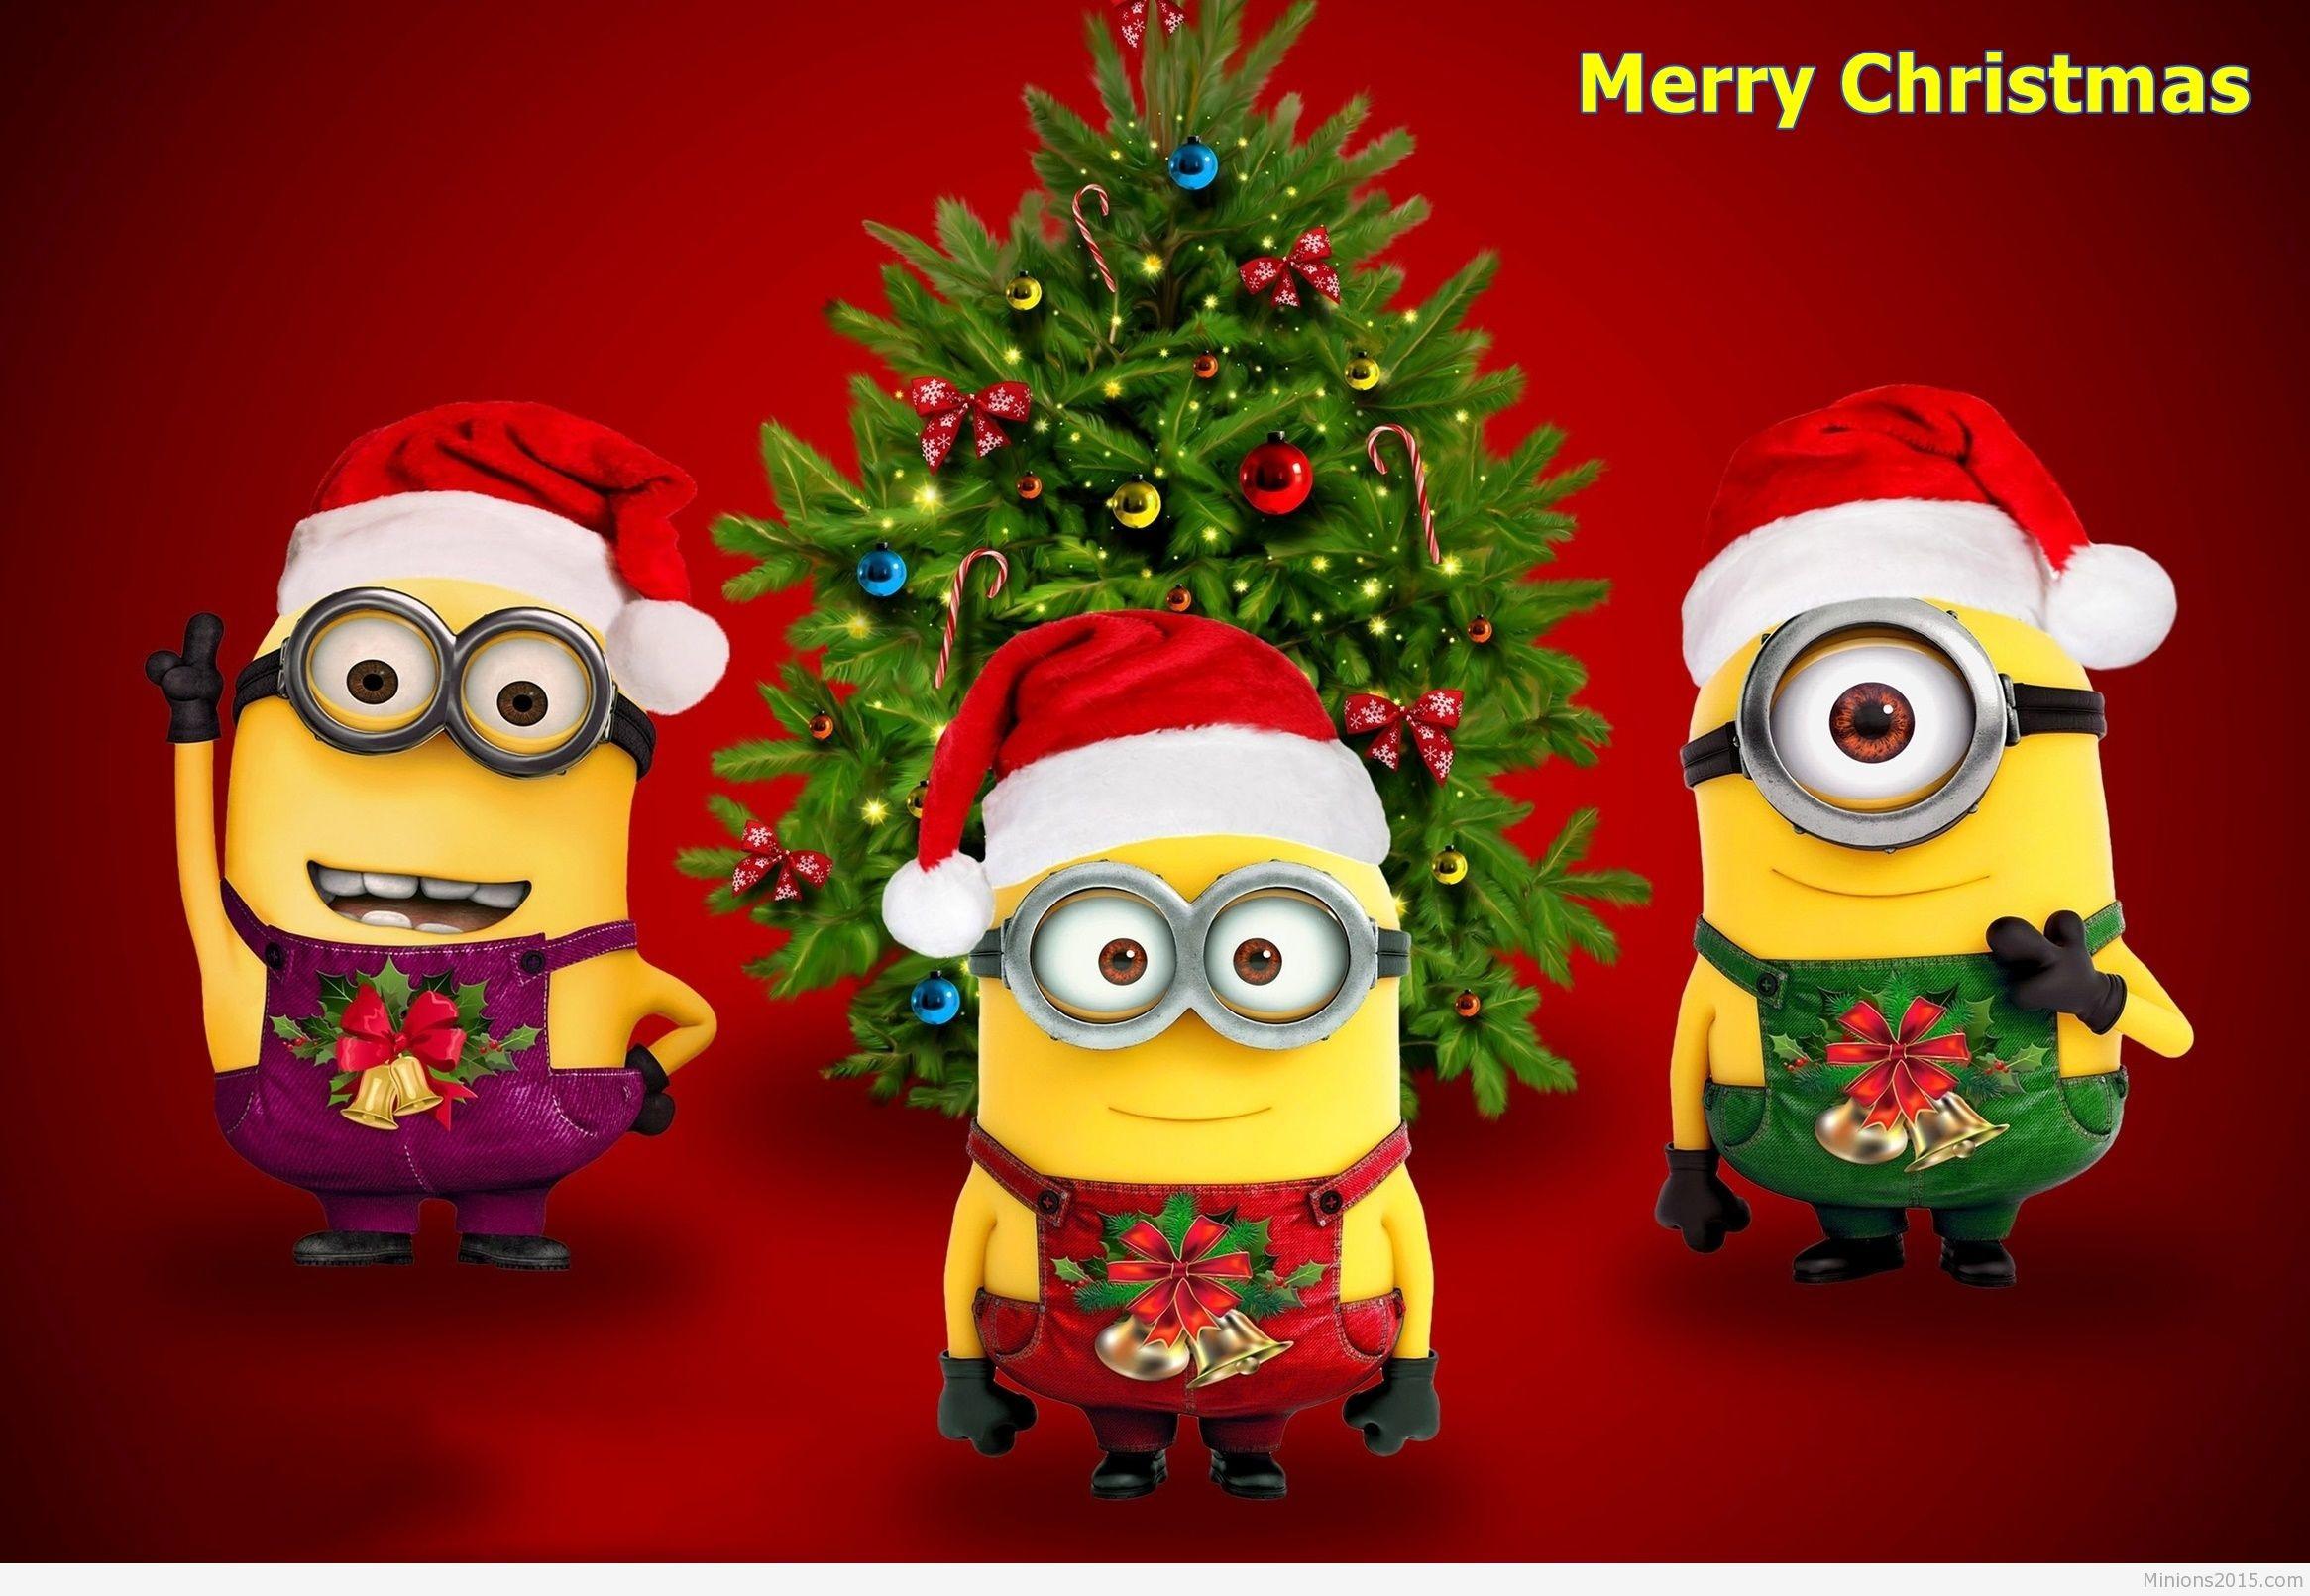 34001-merry-christmas-minions-2560×1600-holiday-wallpaper.  77064e4e9ccc289ee5394dd7dbf48011